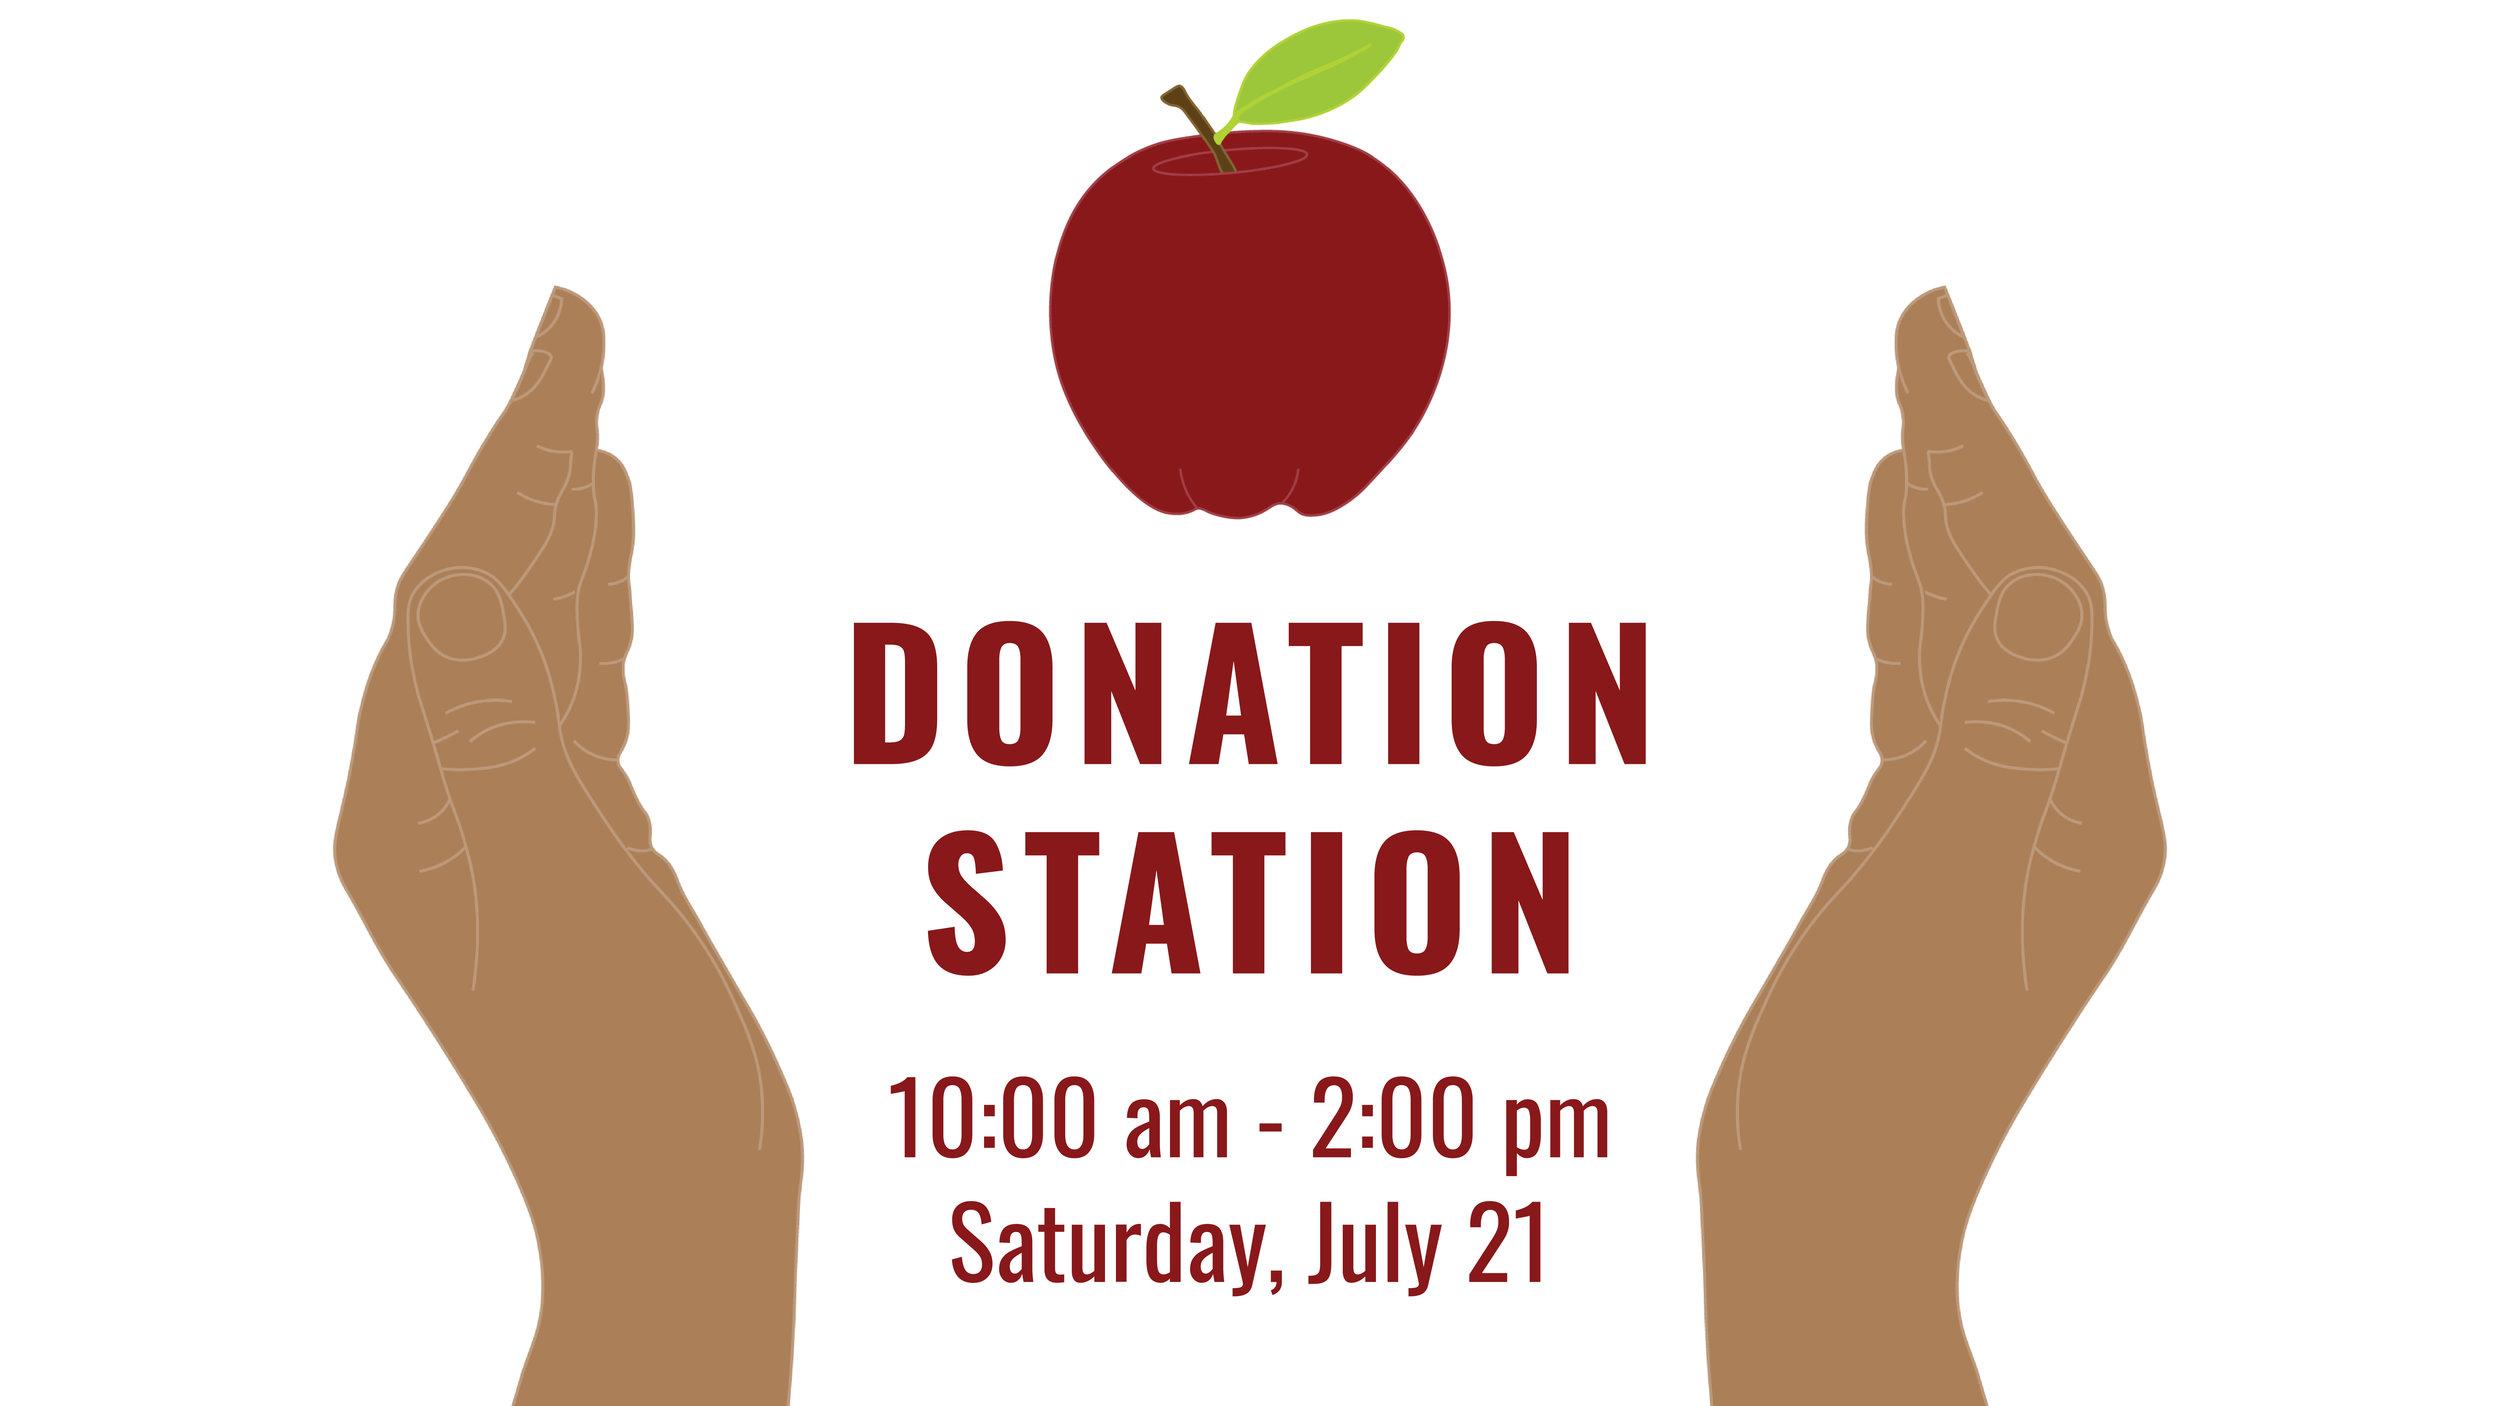 180718 Donation Station FB Event Image.jpg